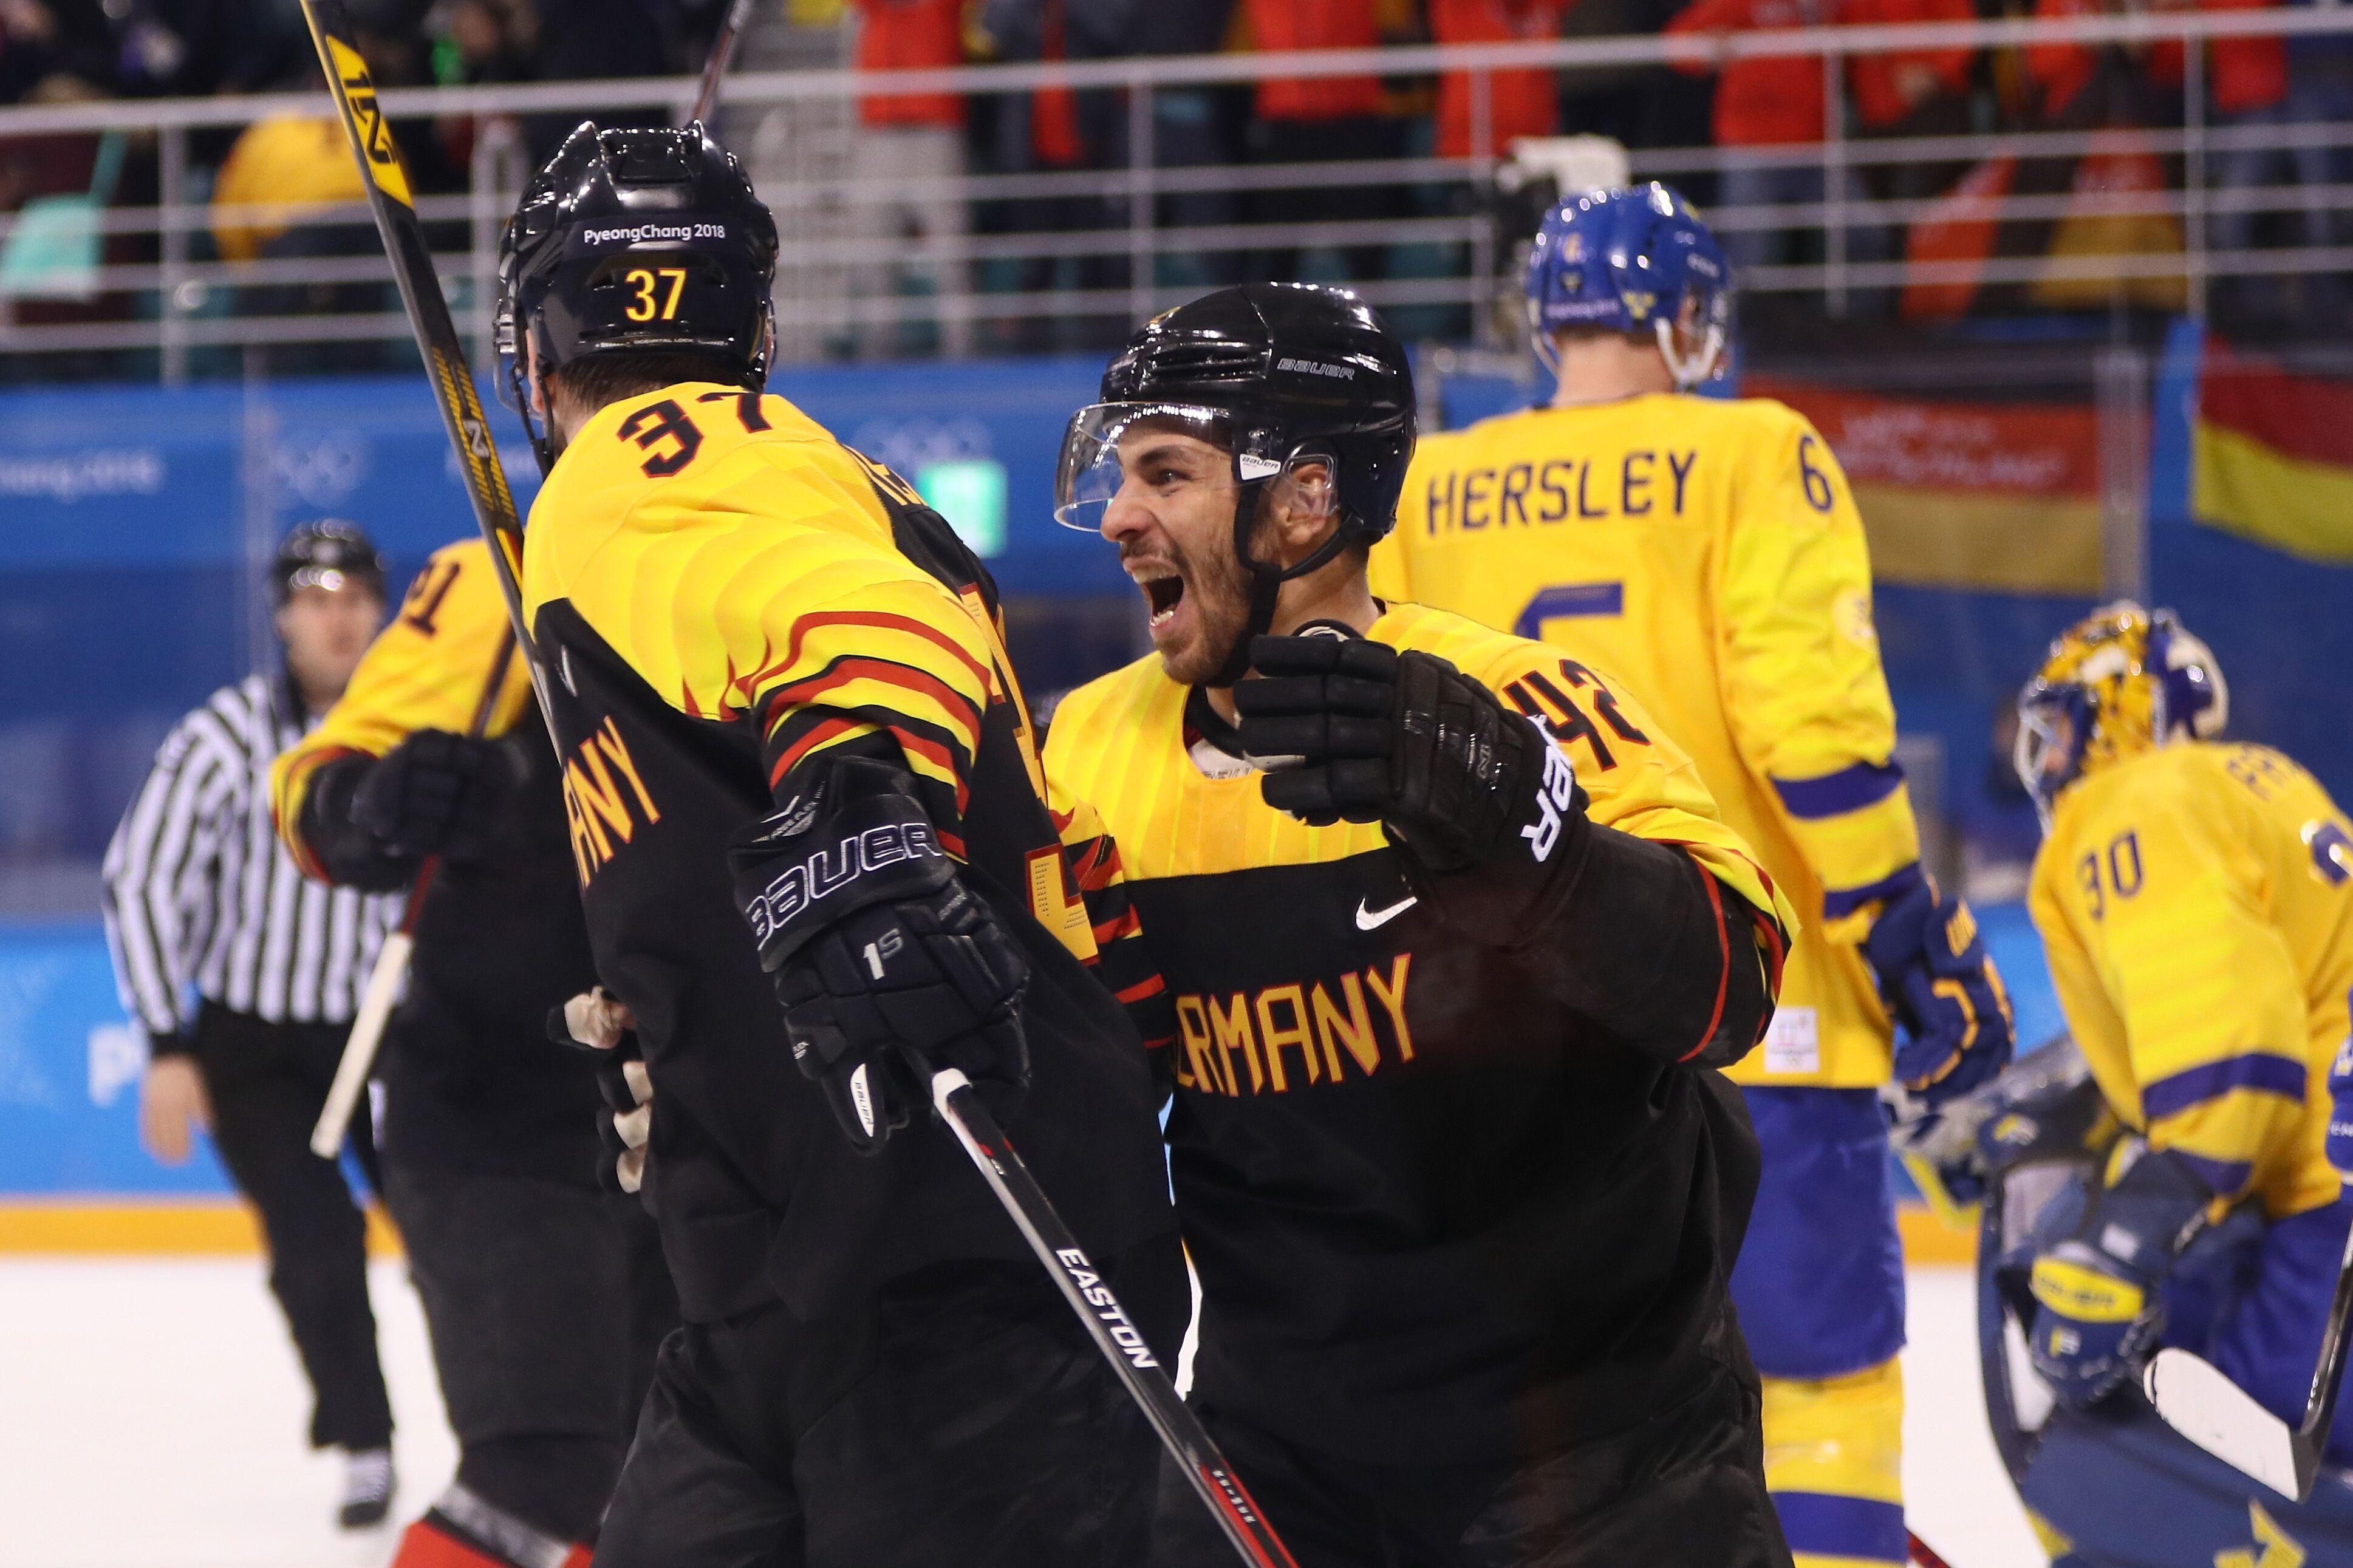 Olympics Men's hockey quarterfinal, Sweden vs. Germany ...